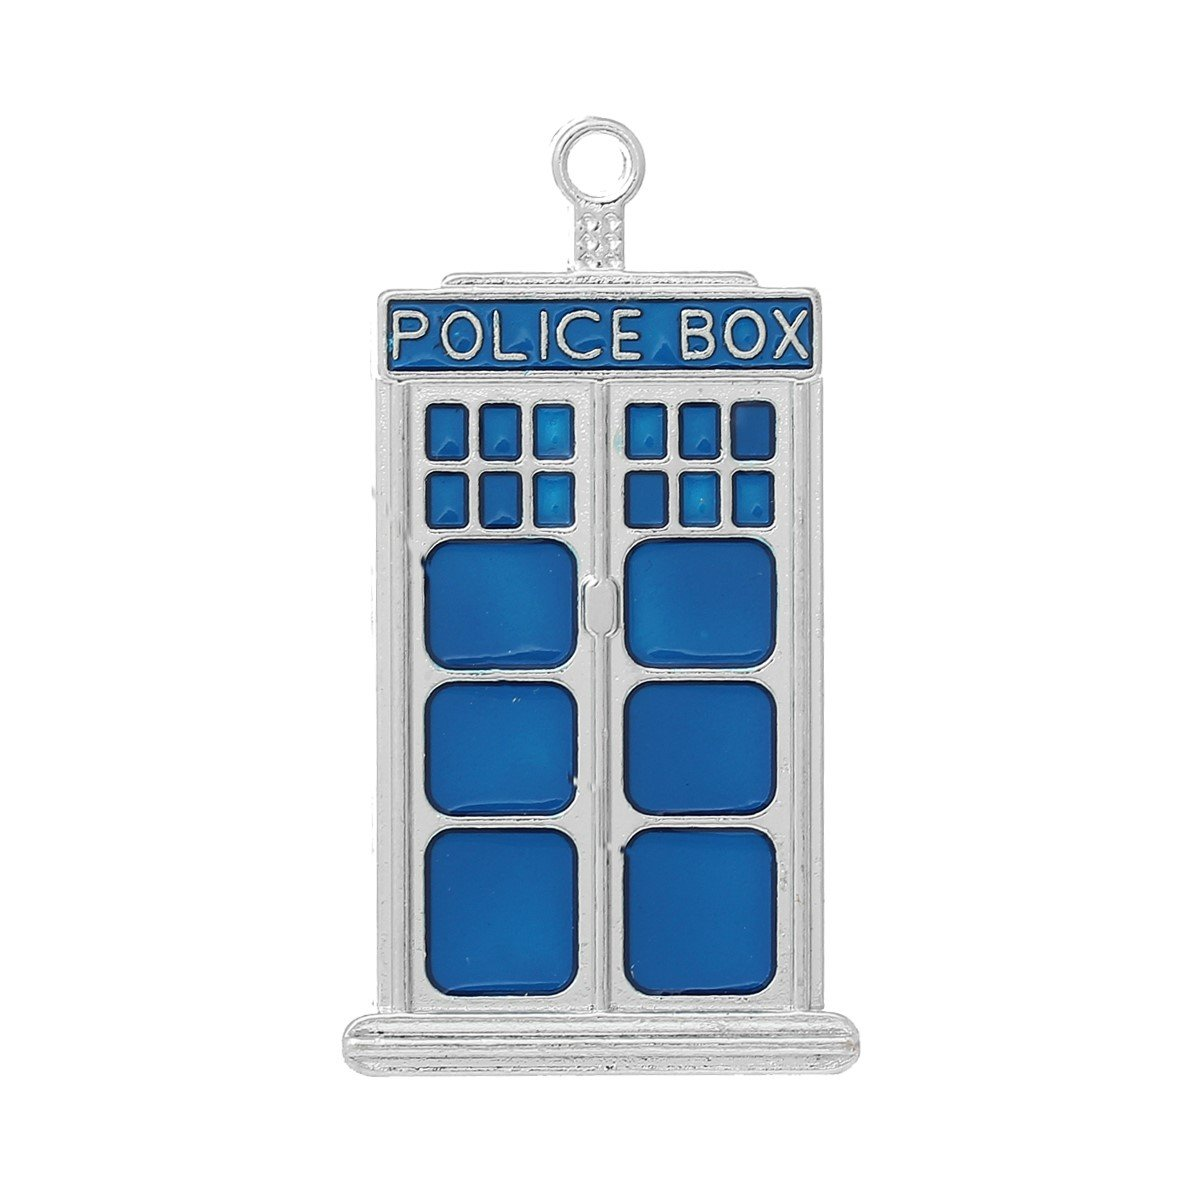 2 x Tibetan Silver & Blue Enamel TARDIS DR WHO POLICE BOX SCI-FI 50mm Charms Pendants Beads Pink Cat Charms